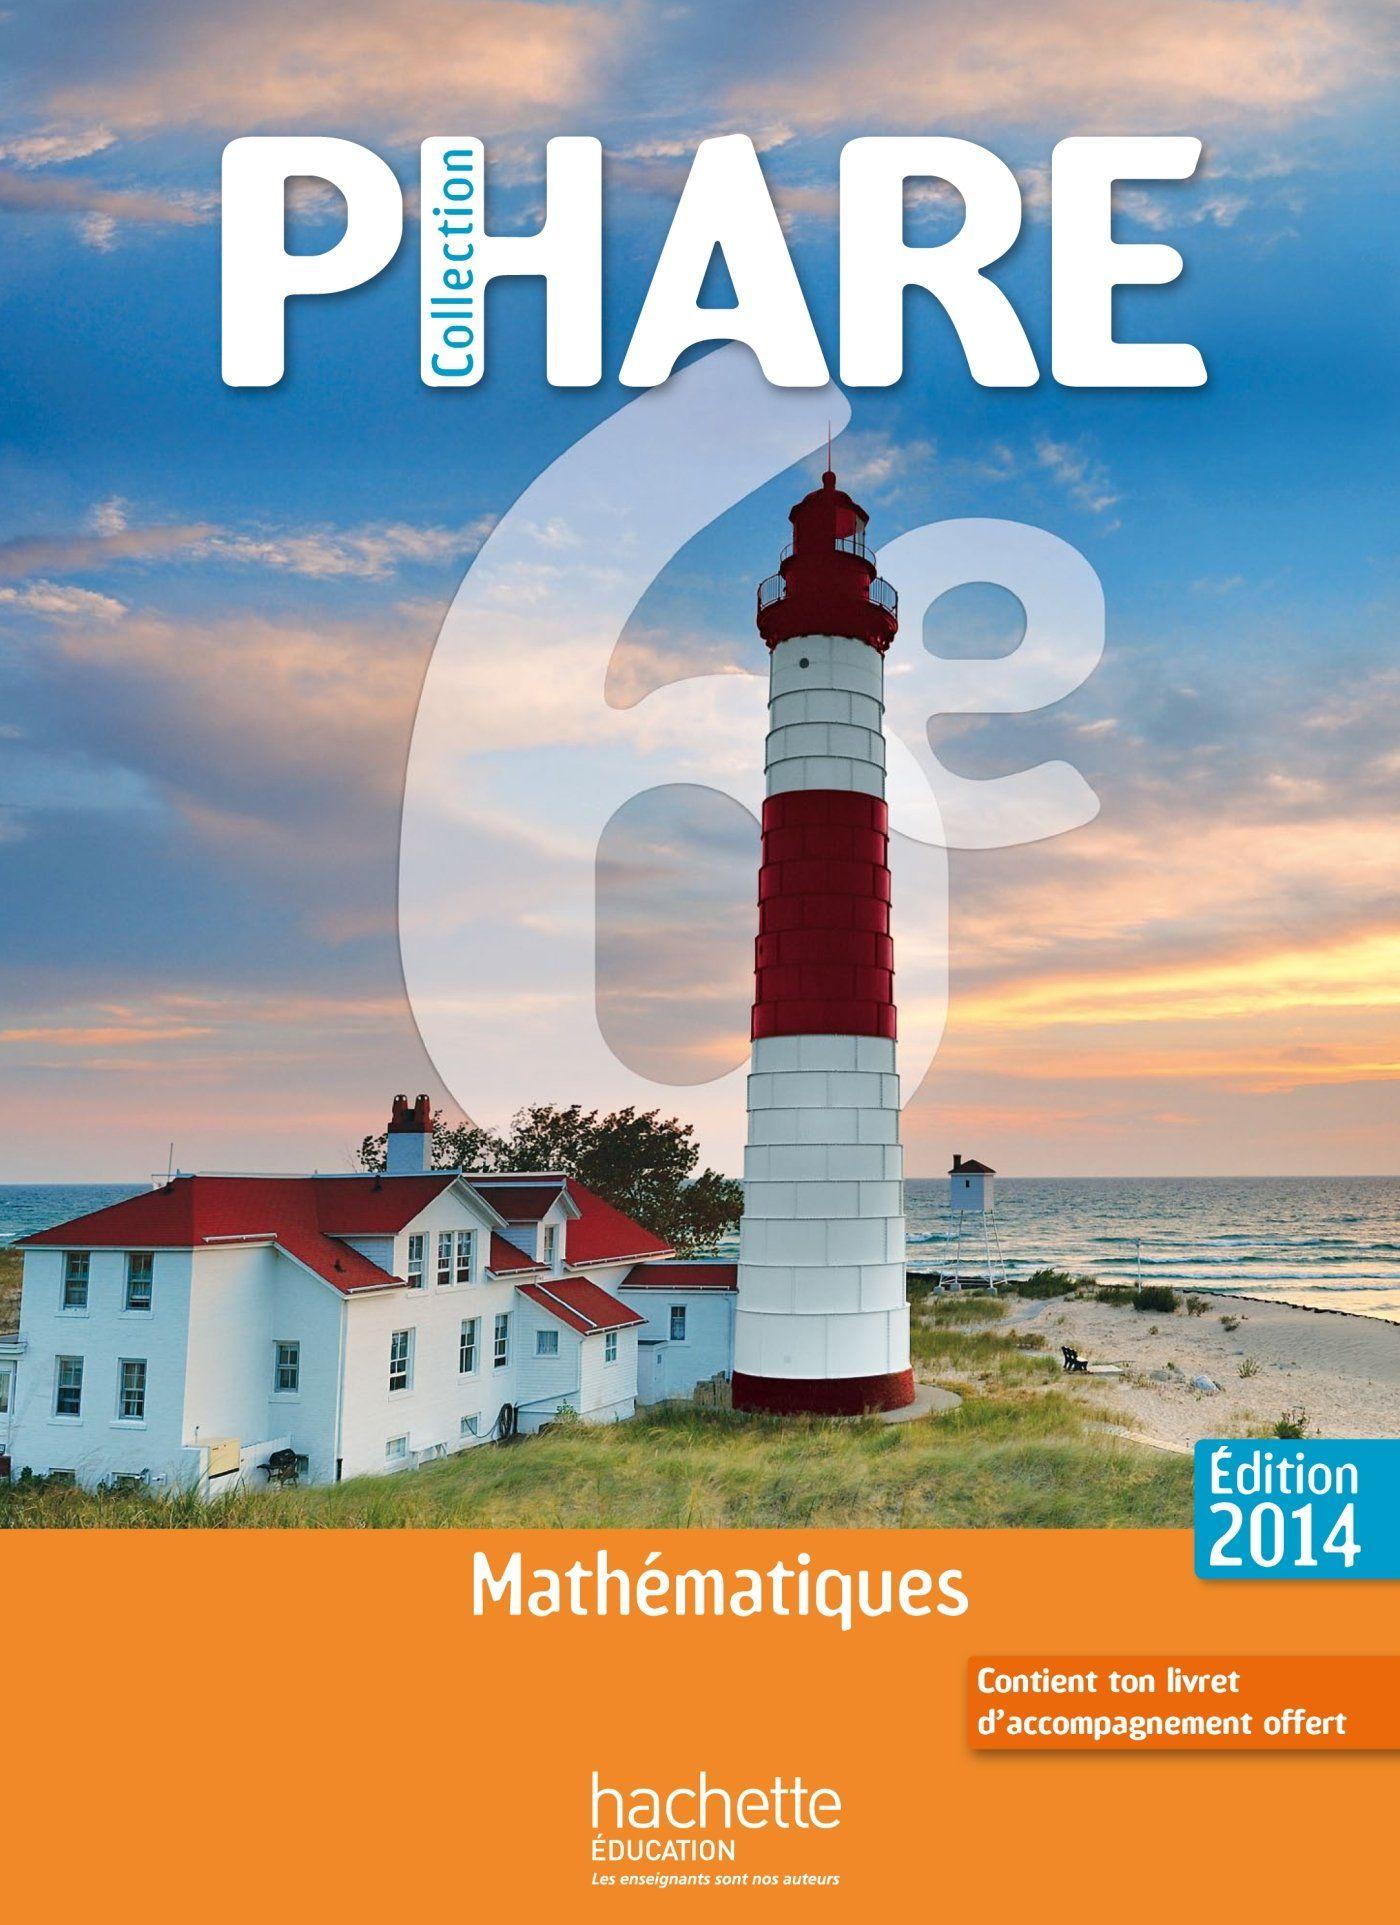 Le Phare 4eme Corrige Mathematiques College Mathematiques 6eme Mathematiques